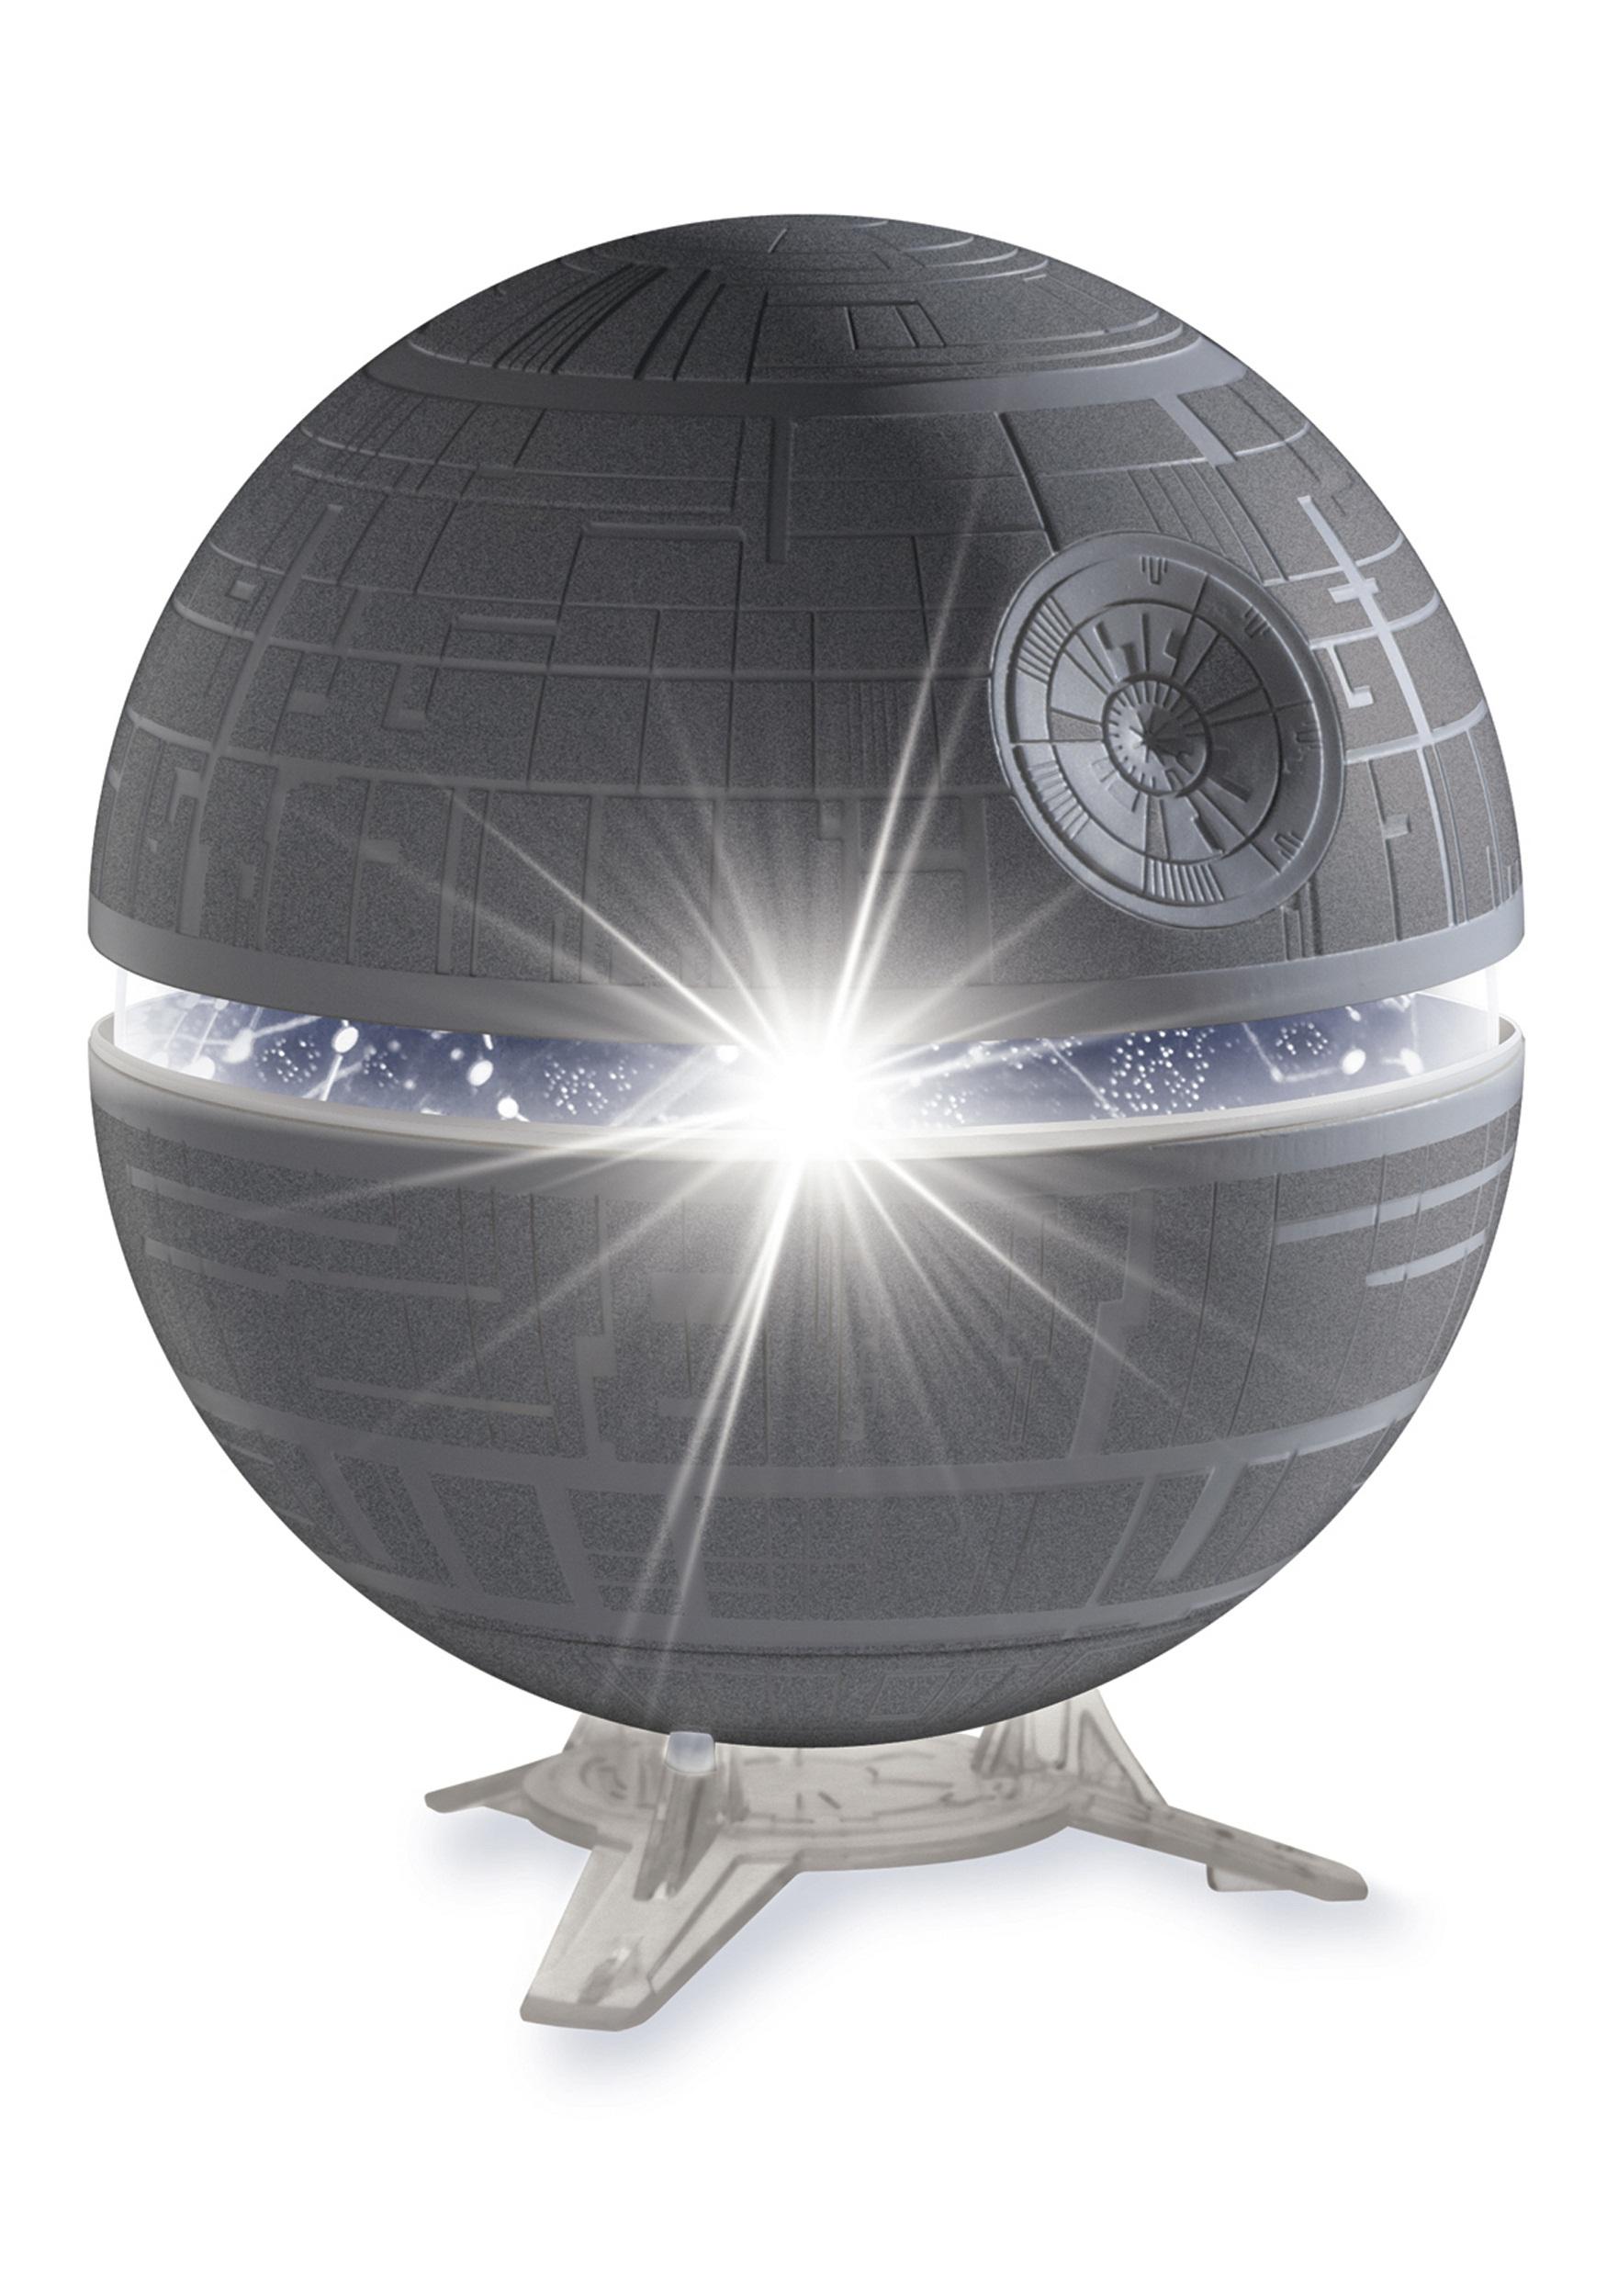 Planetarium Death Star